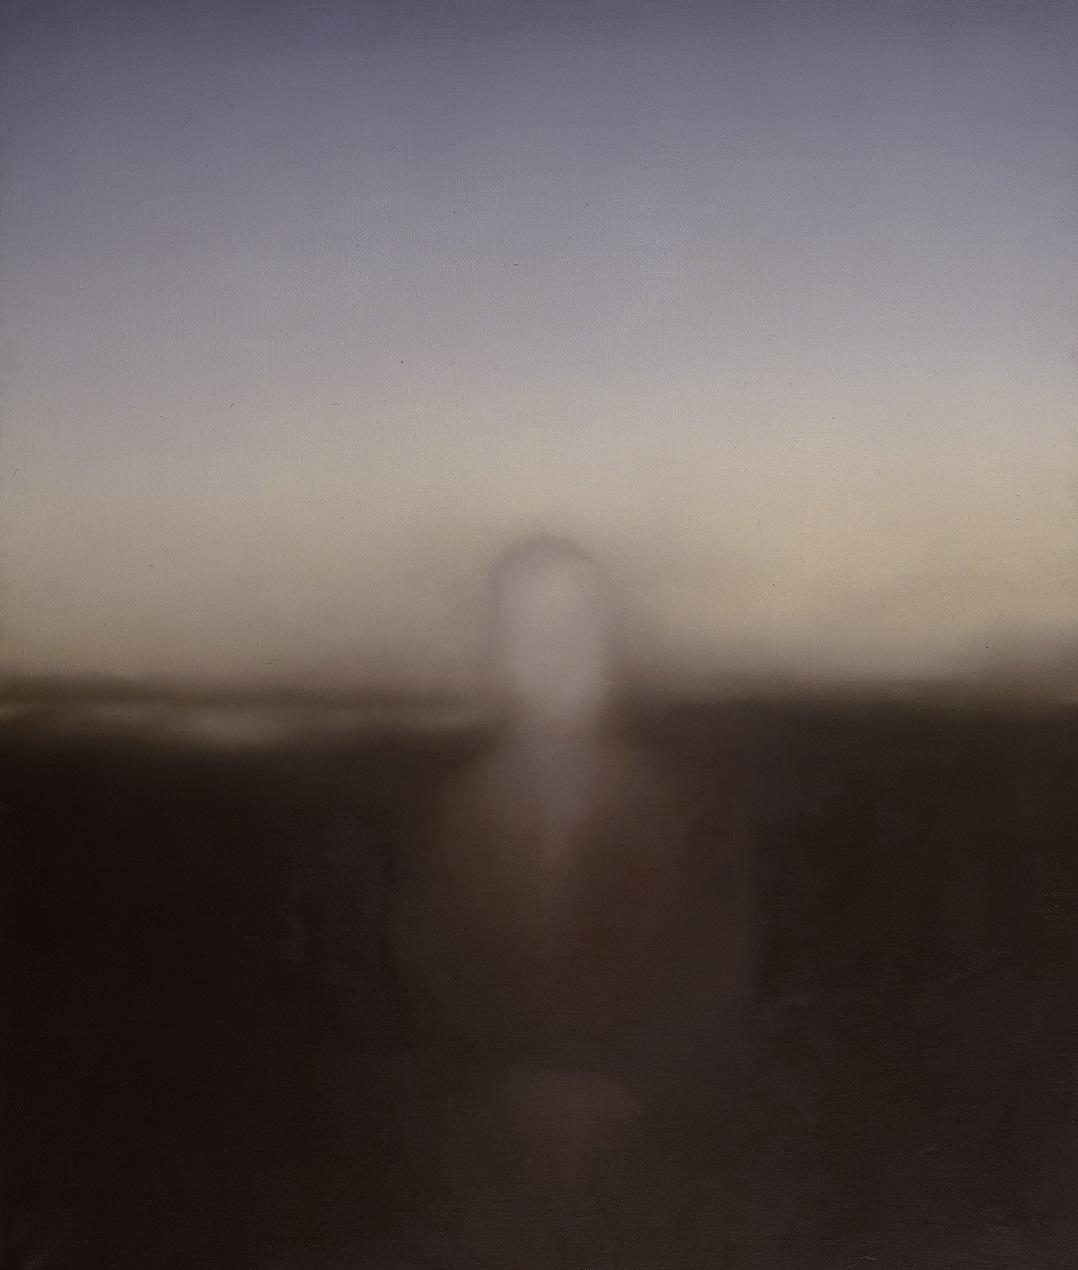 Gerhard Richter (* 1932), retrat de Dieter Kreutz, 1971, oli sobre tela, 150 × 125 cm. © Gerhard Richter 2019, foto: Anne Gold